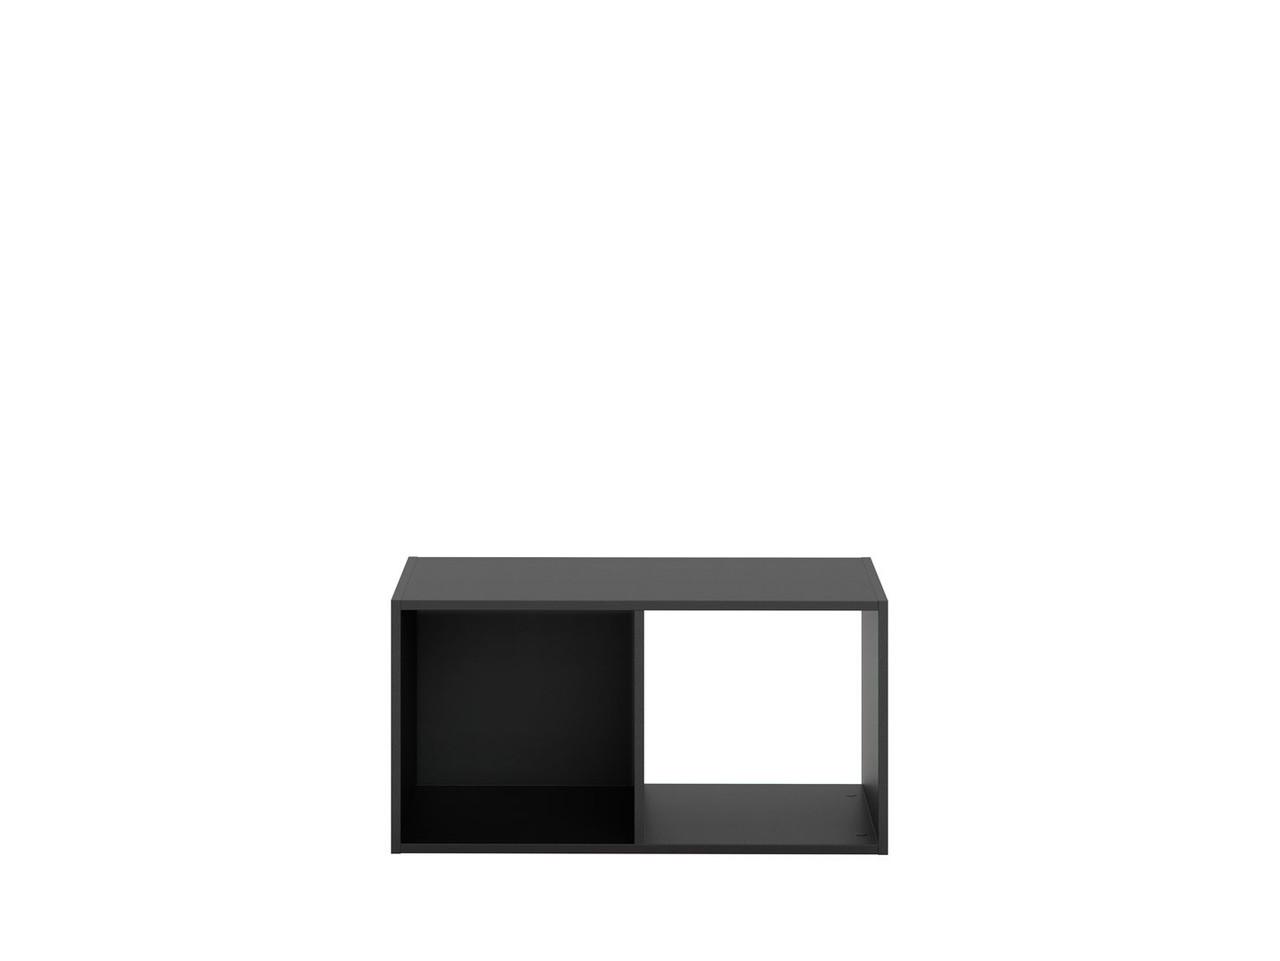 Навесный шкафчик Modai  40/80  S372-REG/40/80-BIM (BRW)